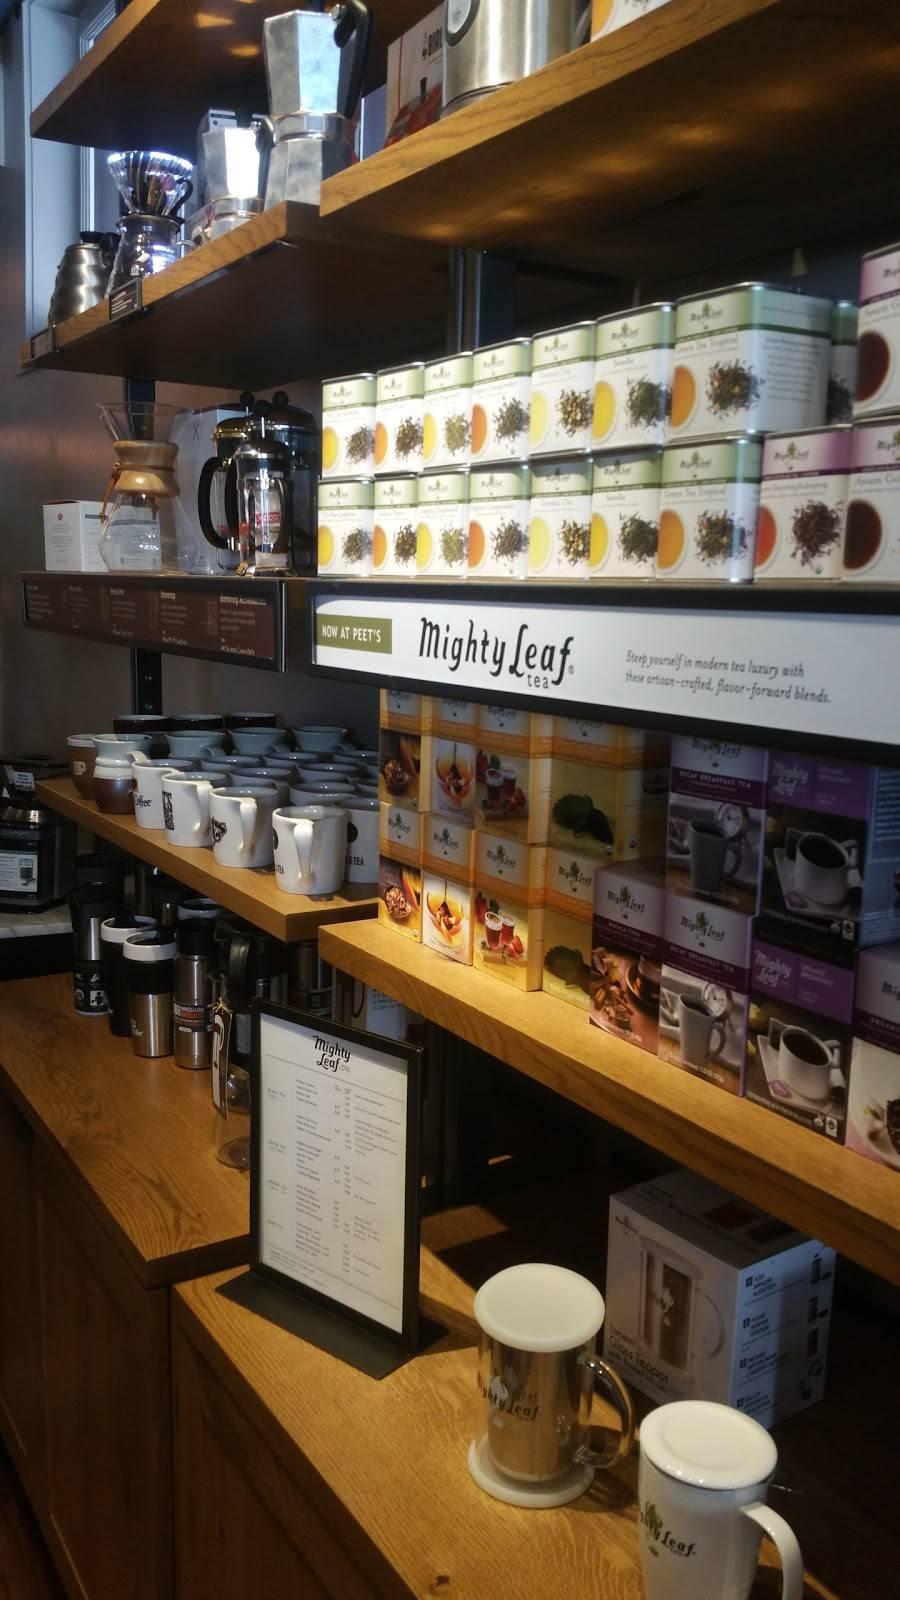 Peets Coffee - cafe    Photo 7 of 10   Address: 4050 Piedmont Ave, Oakland, CA 94611, USA   Phone: (510) 655-3228